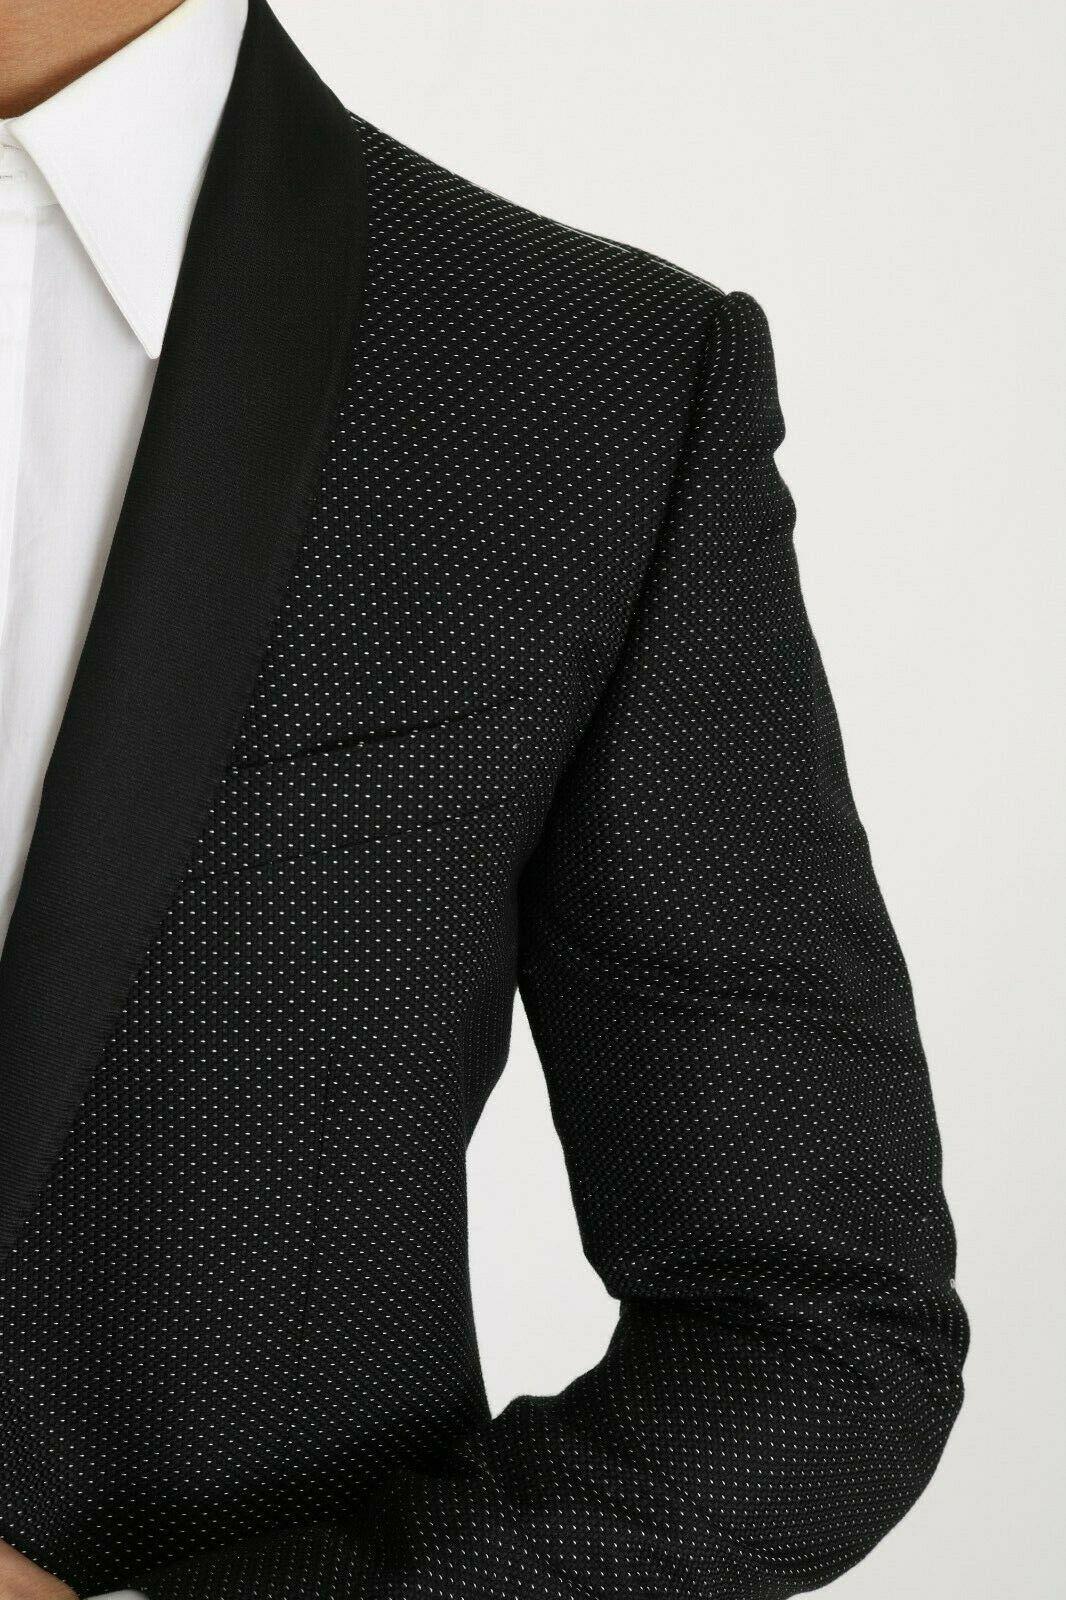 Dolce & Gabbana Men's Cotton Dotted Pattern Blazer Black JKT2270 - IT56 | 3XL